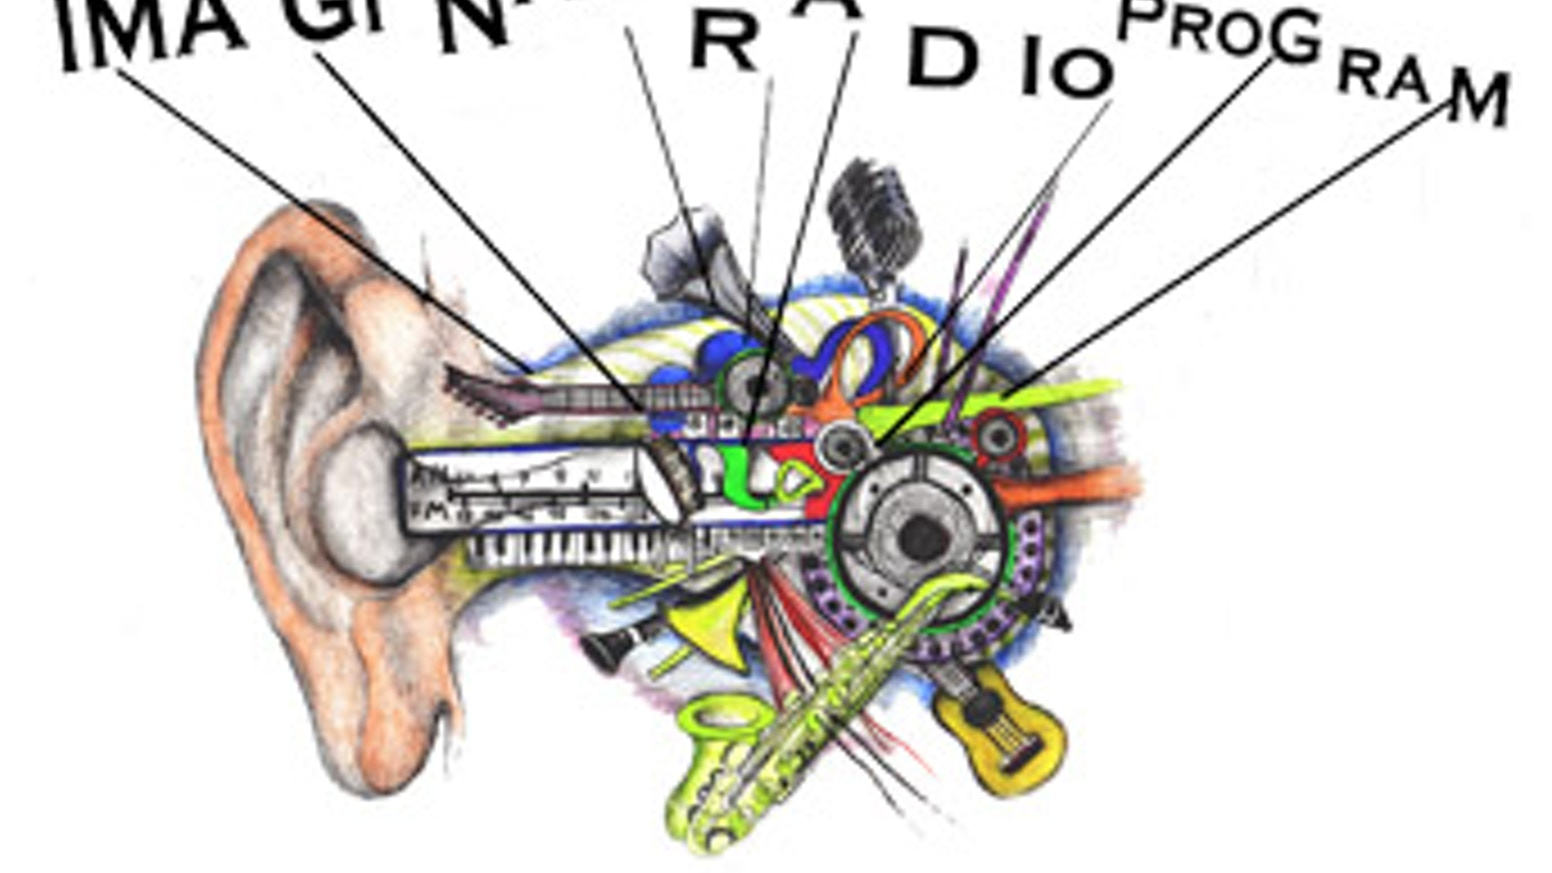 The Imaginary Radio Program at the Edinburgh Fringe Festival